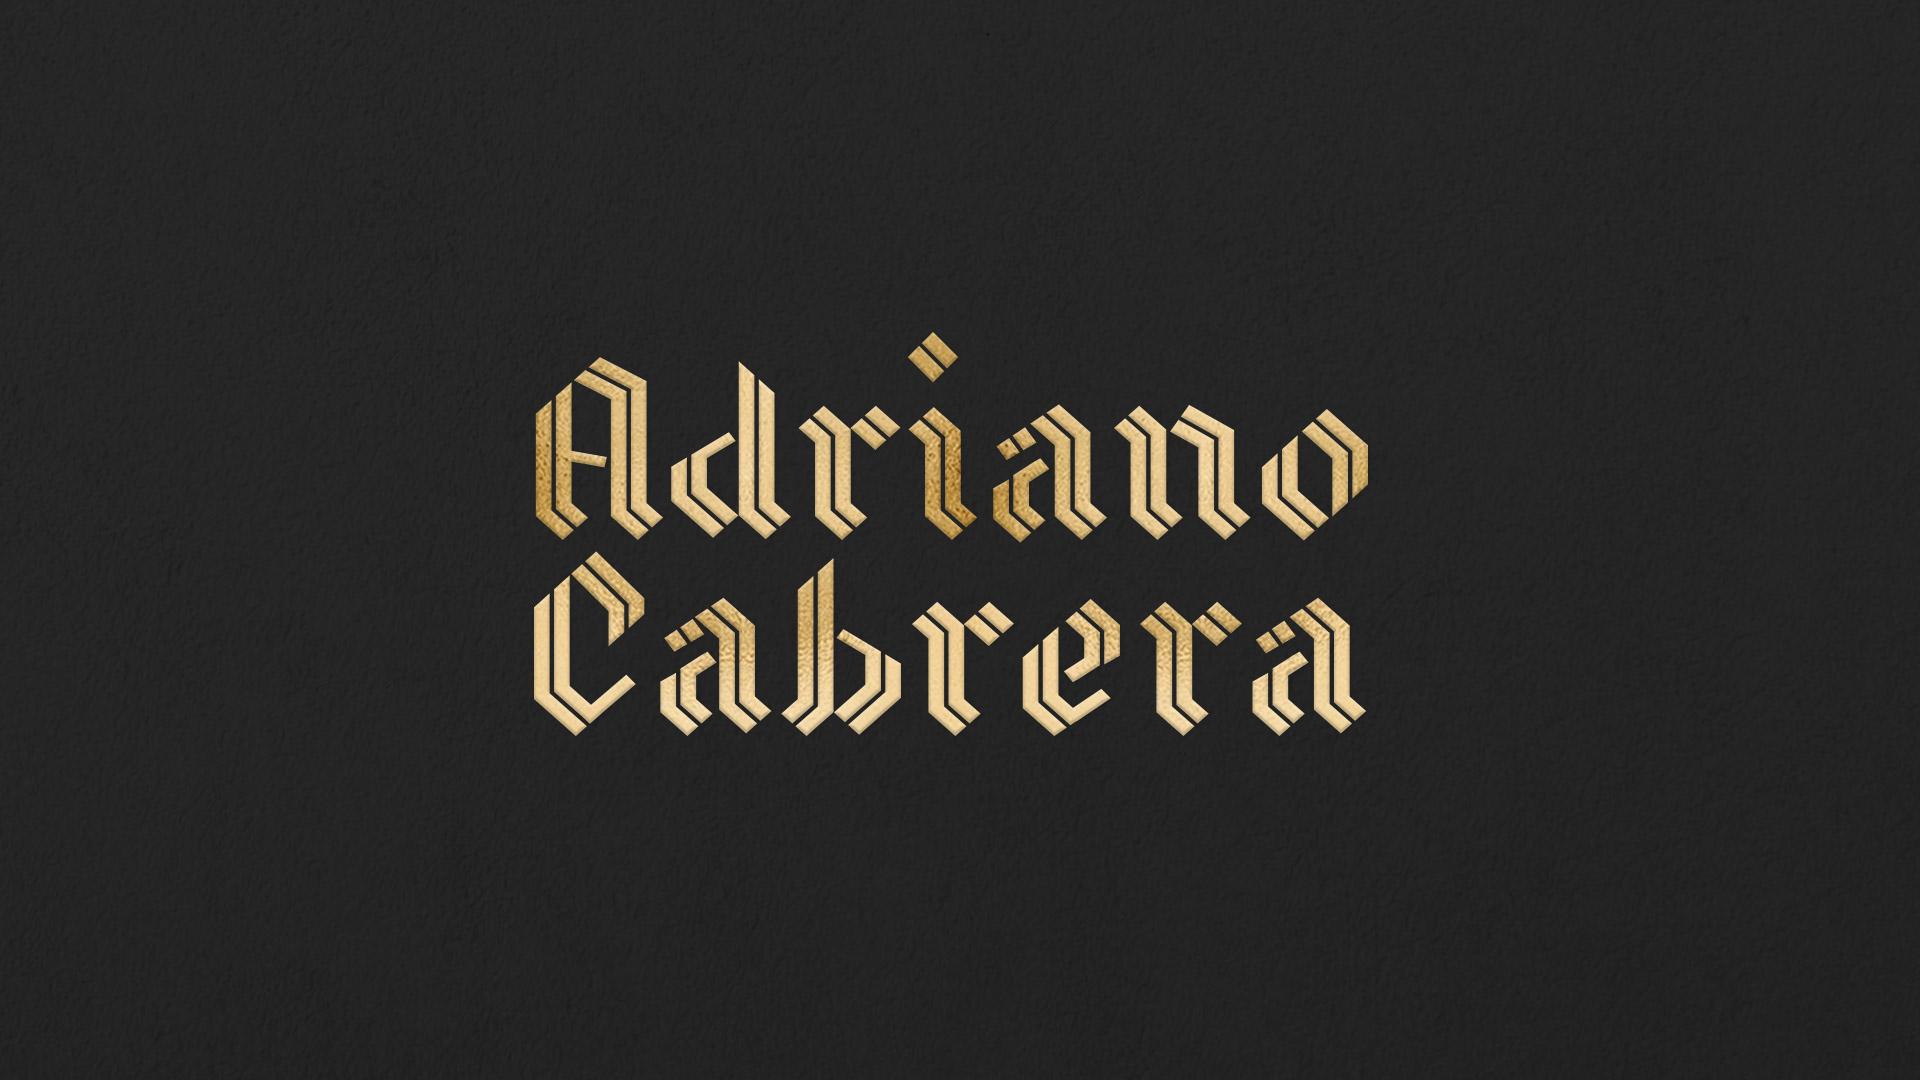 adriano_cabrera_logo.jpg